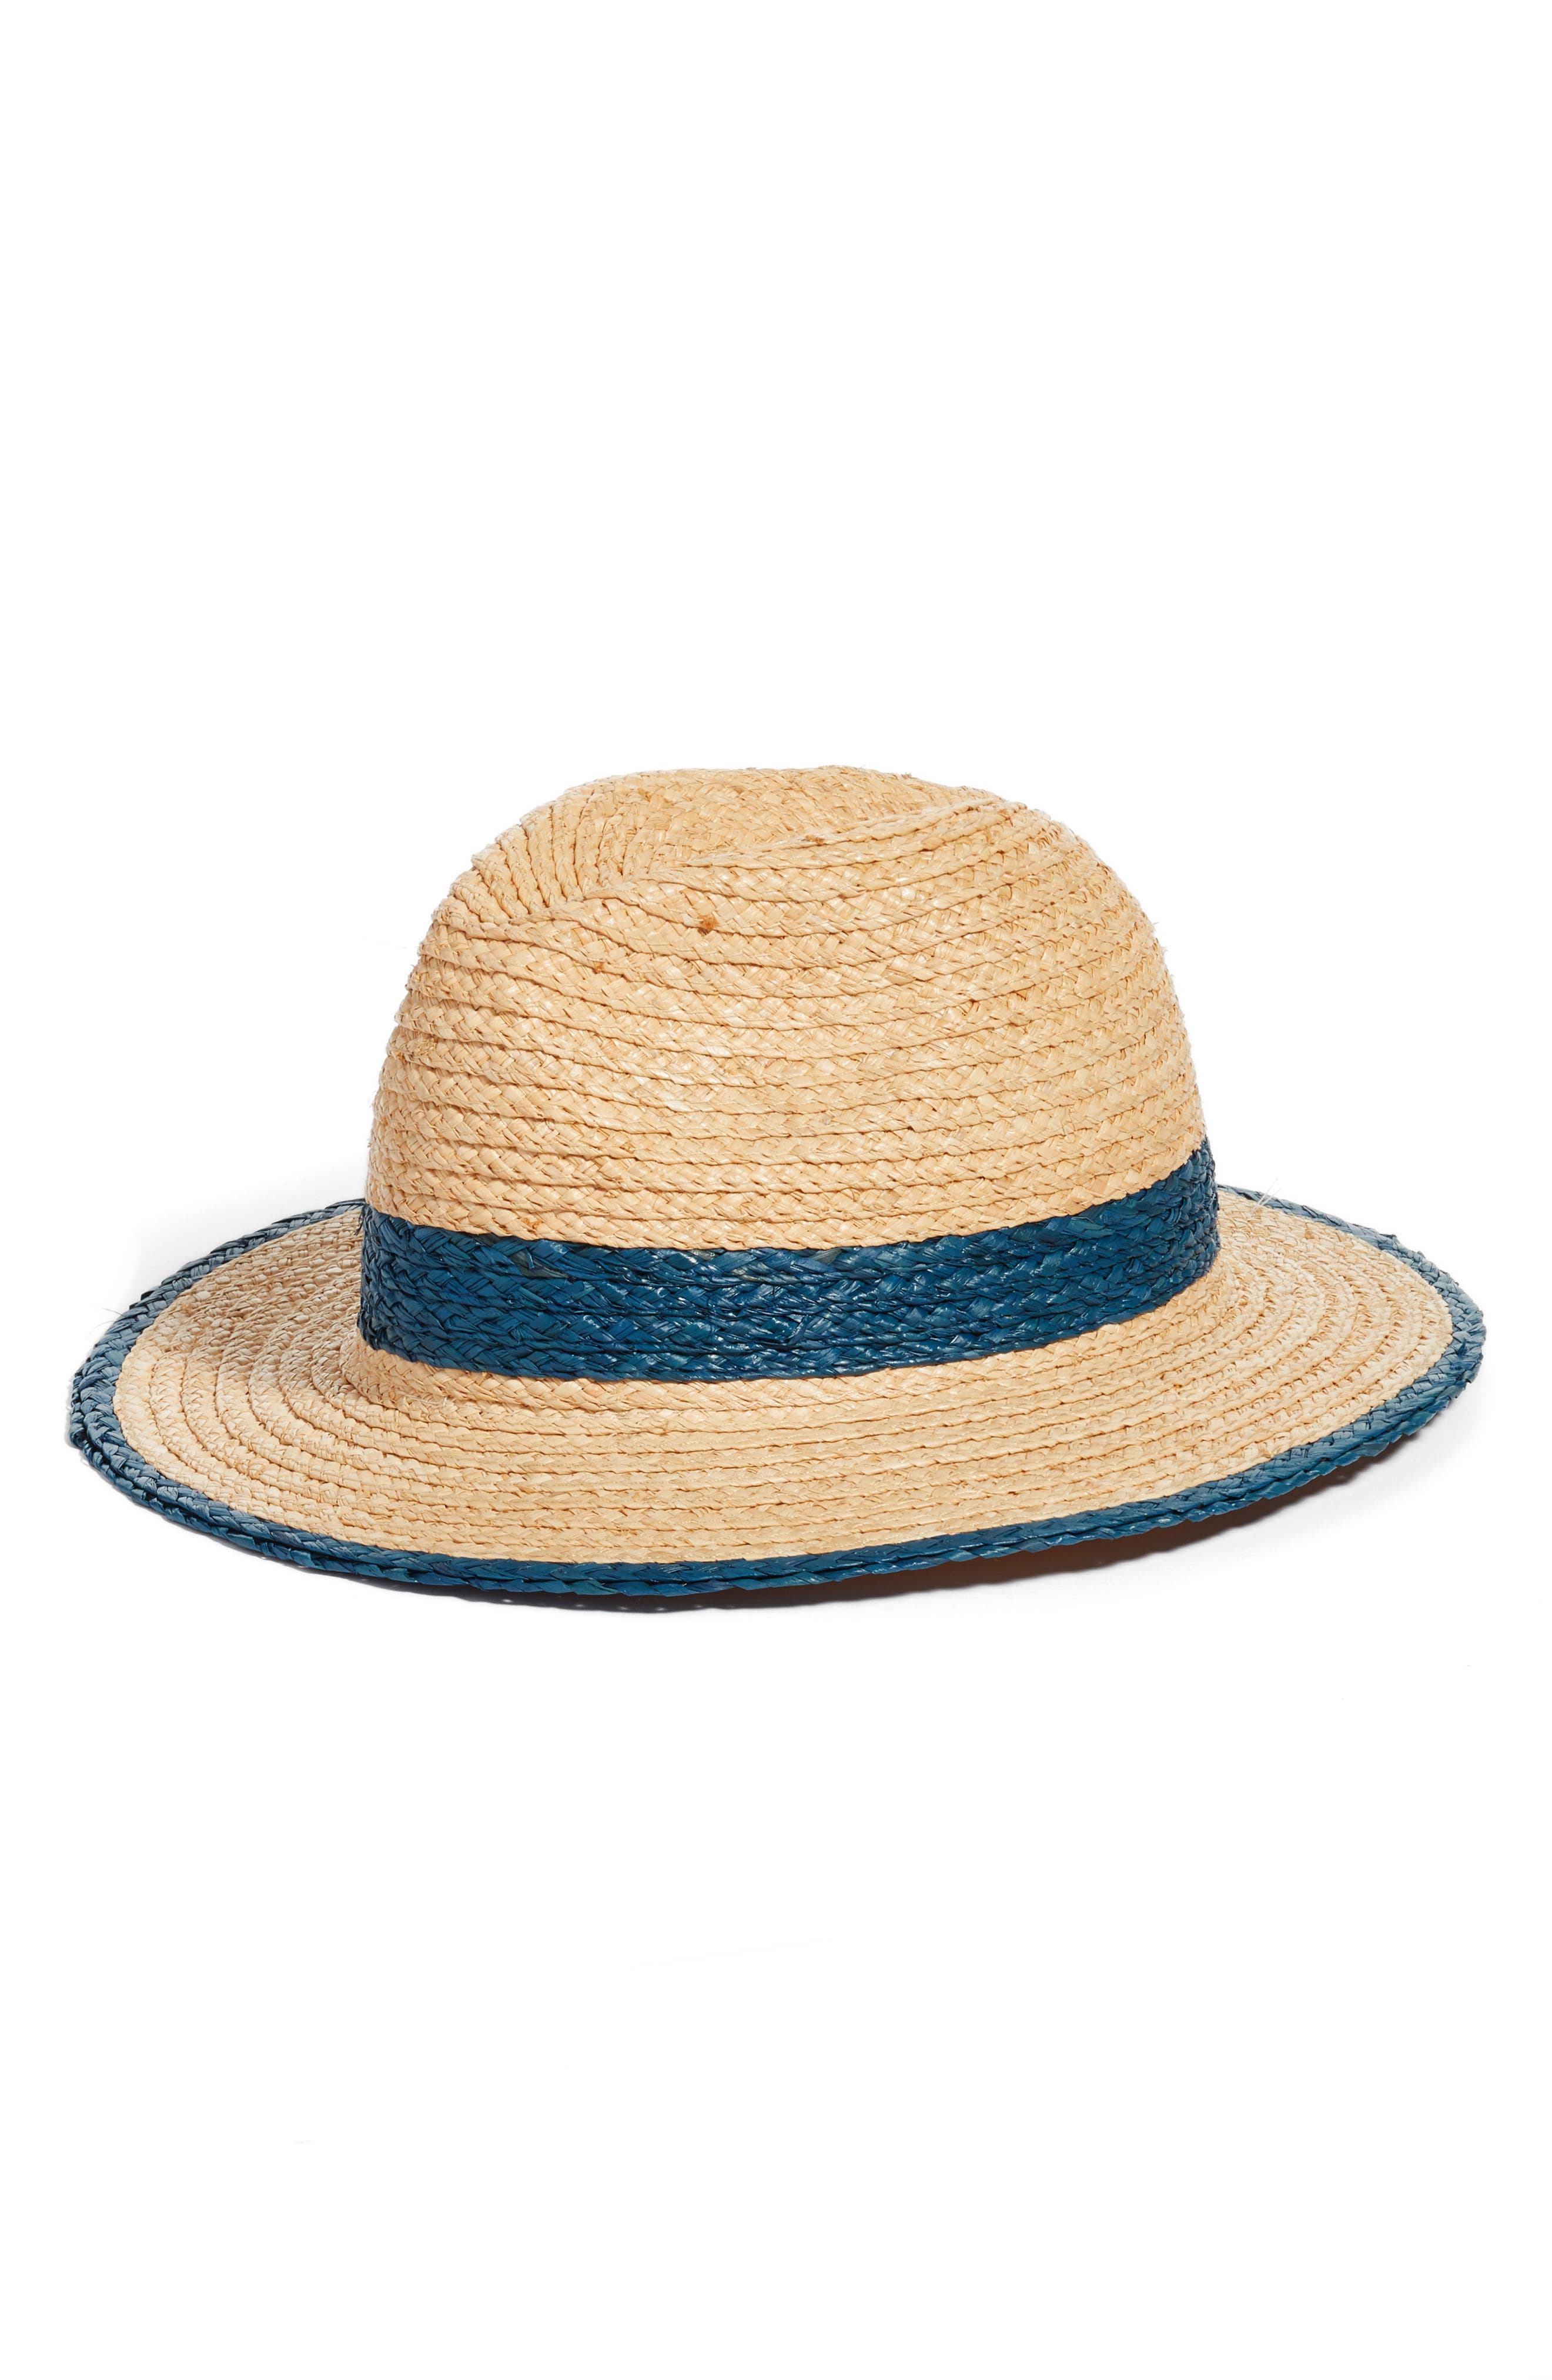 Contrast Trim Straw Panama Hat,                         Main,                         color, Natural Combo